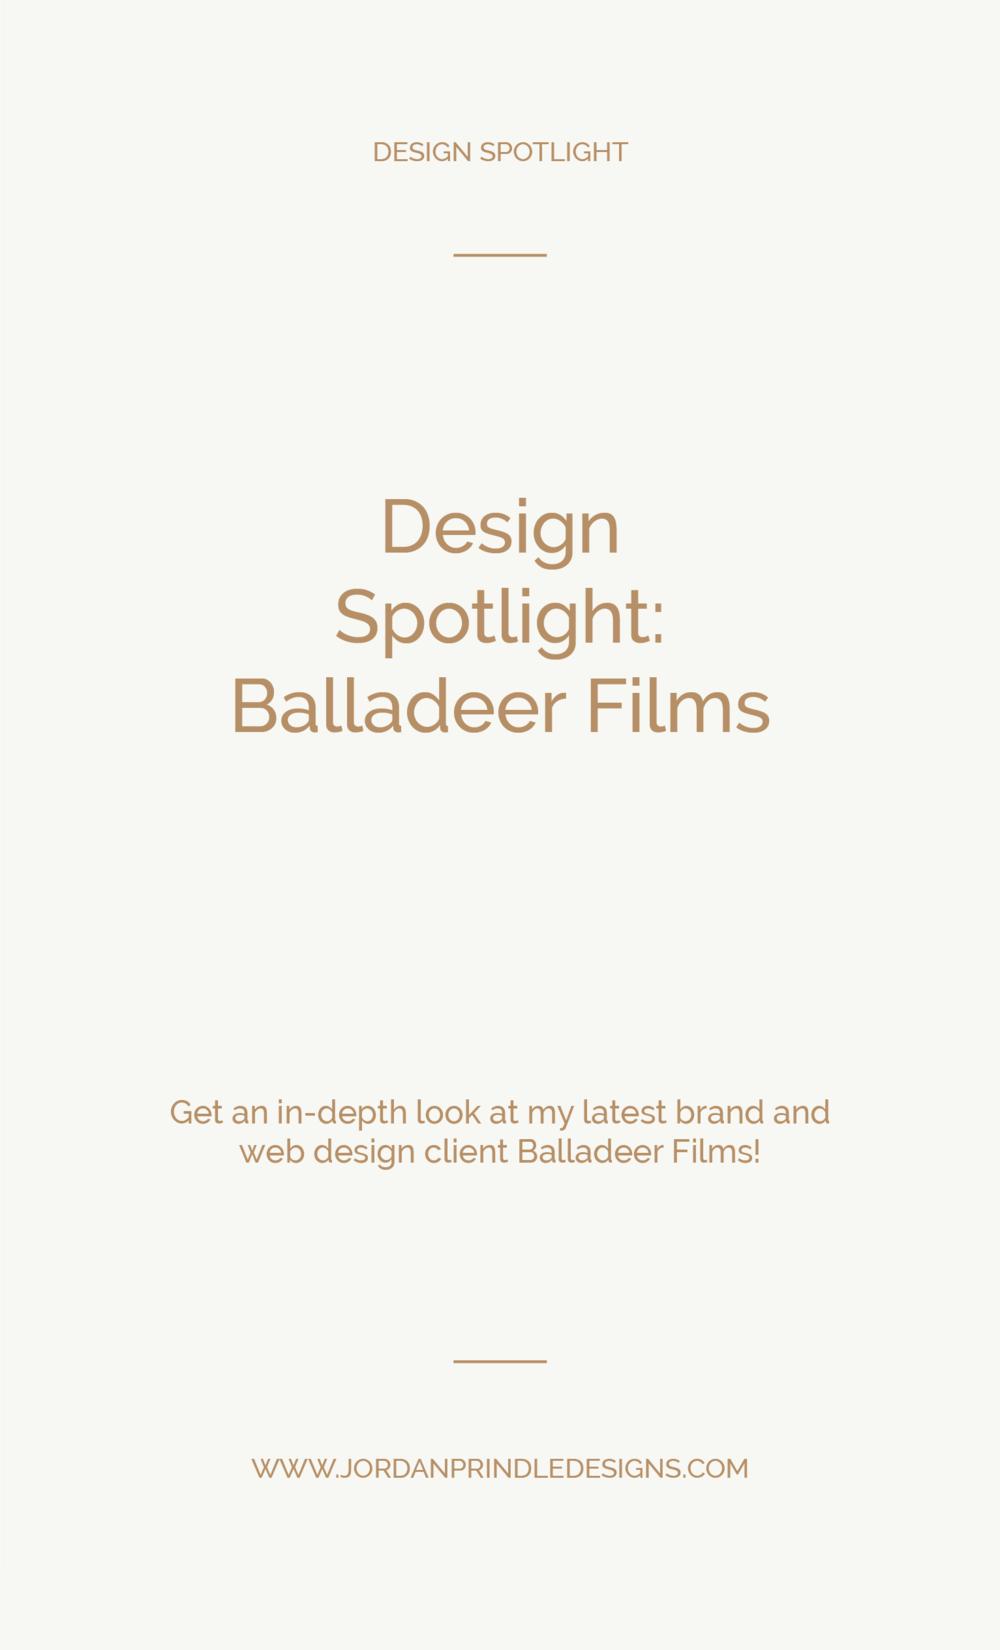 Design Spotlight Balladeer Films | A new brand and web design project completed for Balladeer Films by www.jordanprindledesigns.com #squarespacedesign #branddesigner #newwebdesign